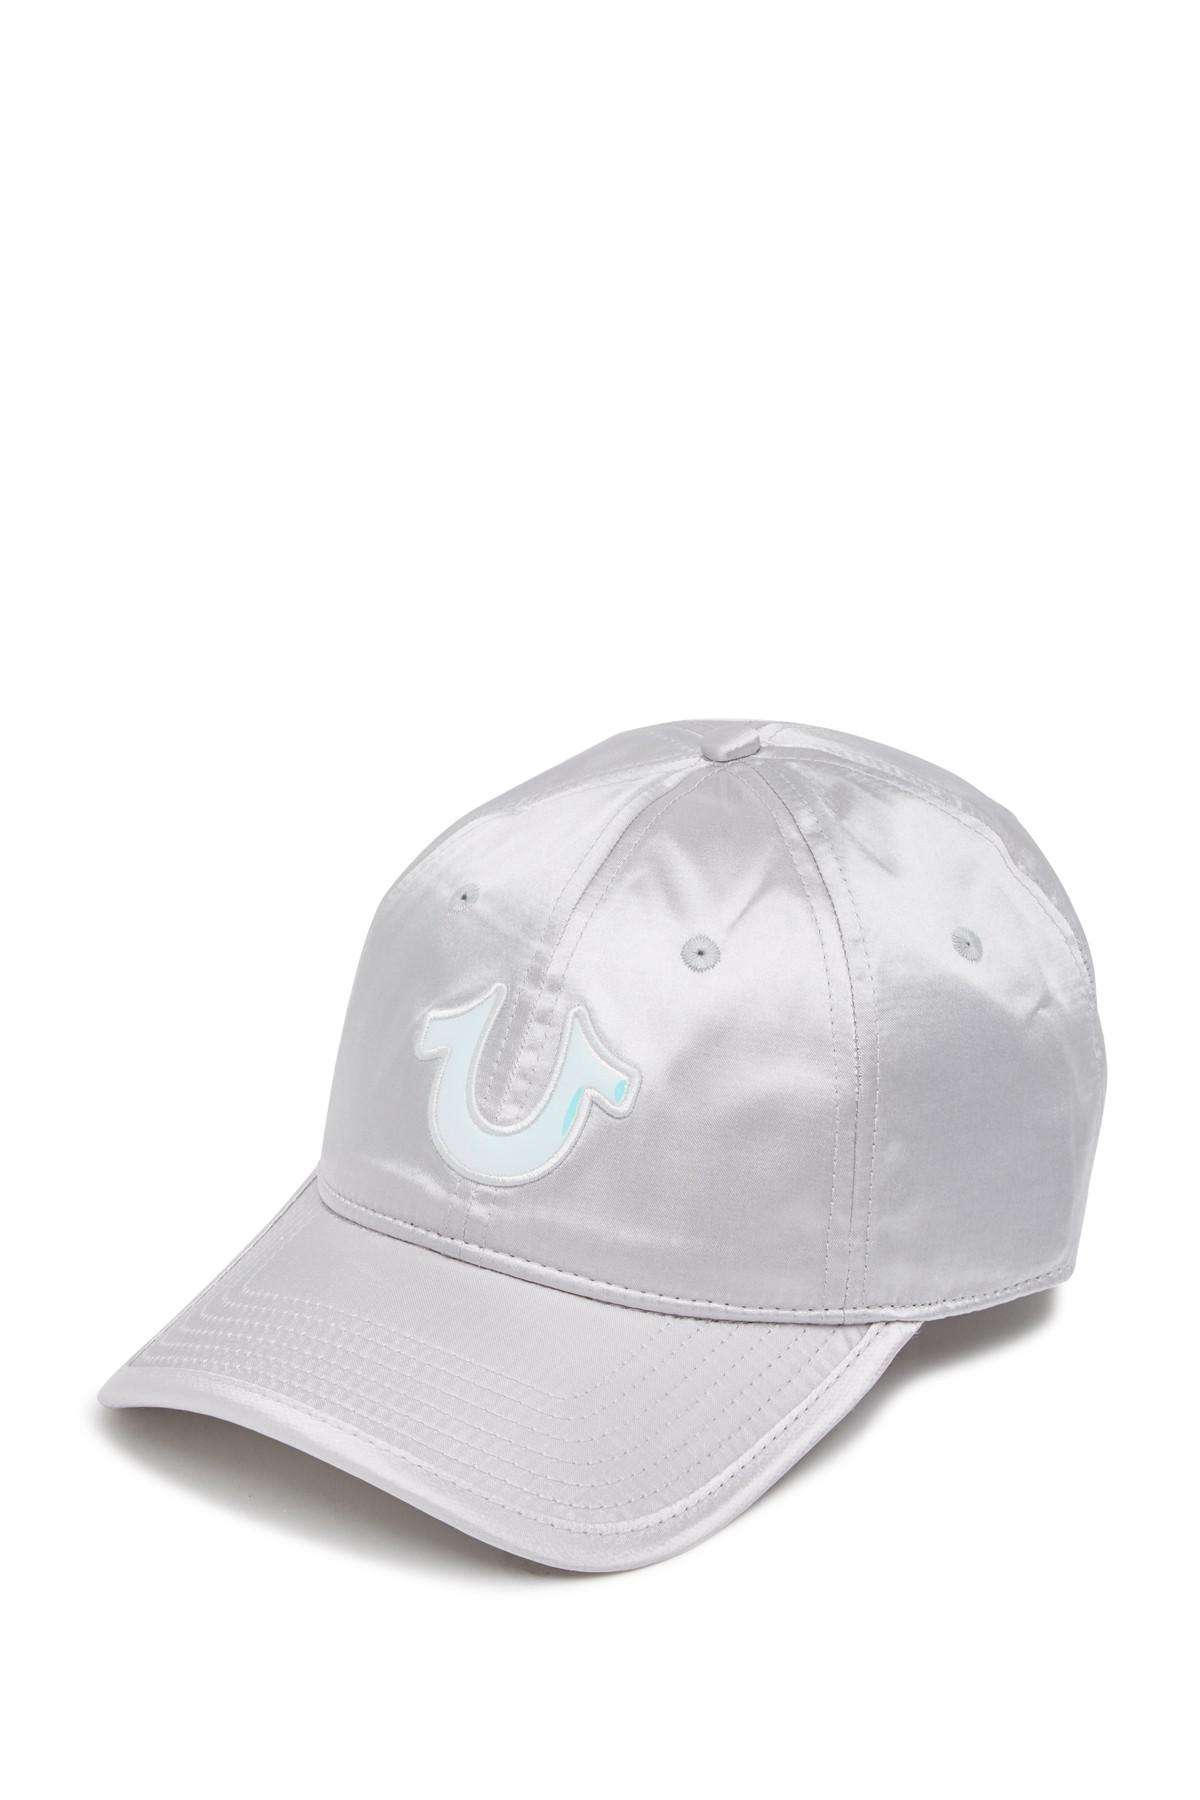 0ef311c2 Lyst - True Religion Satin Baseball Cap in Metallic for Men